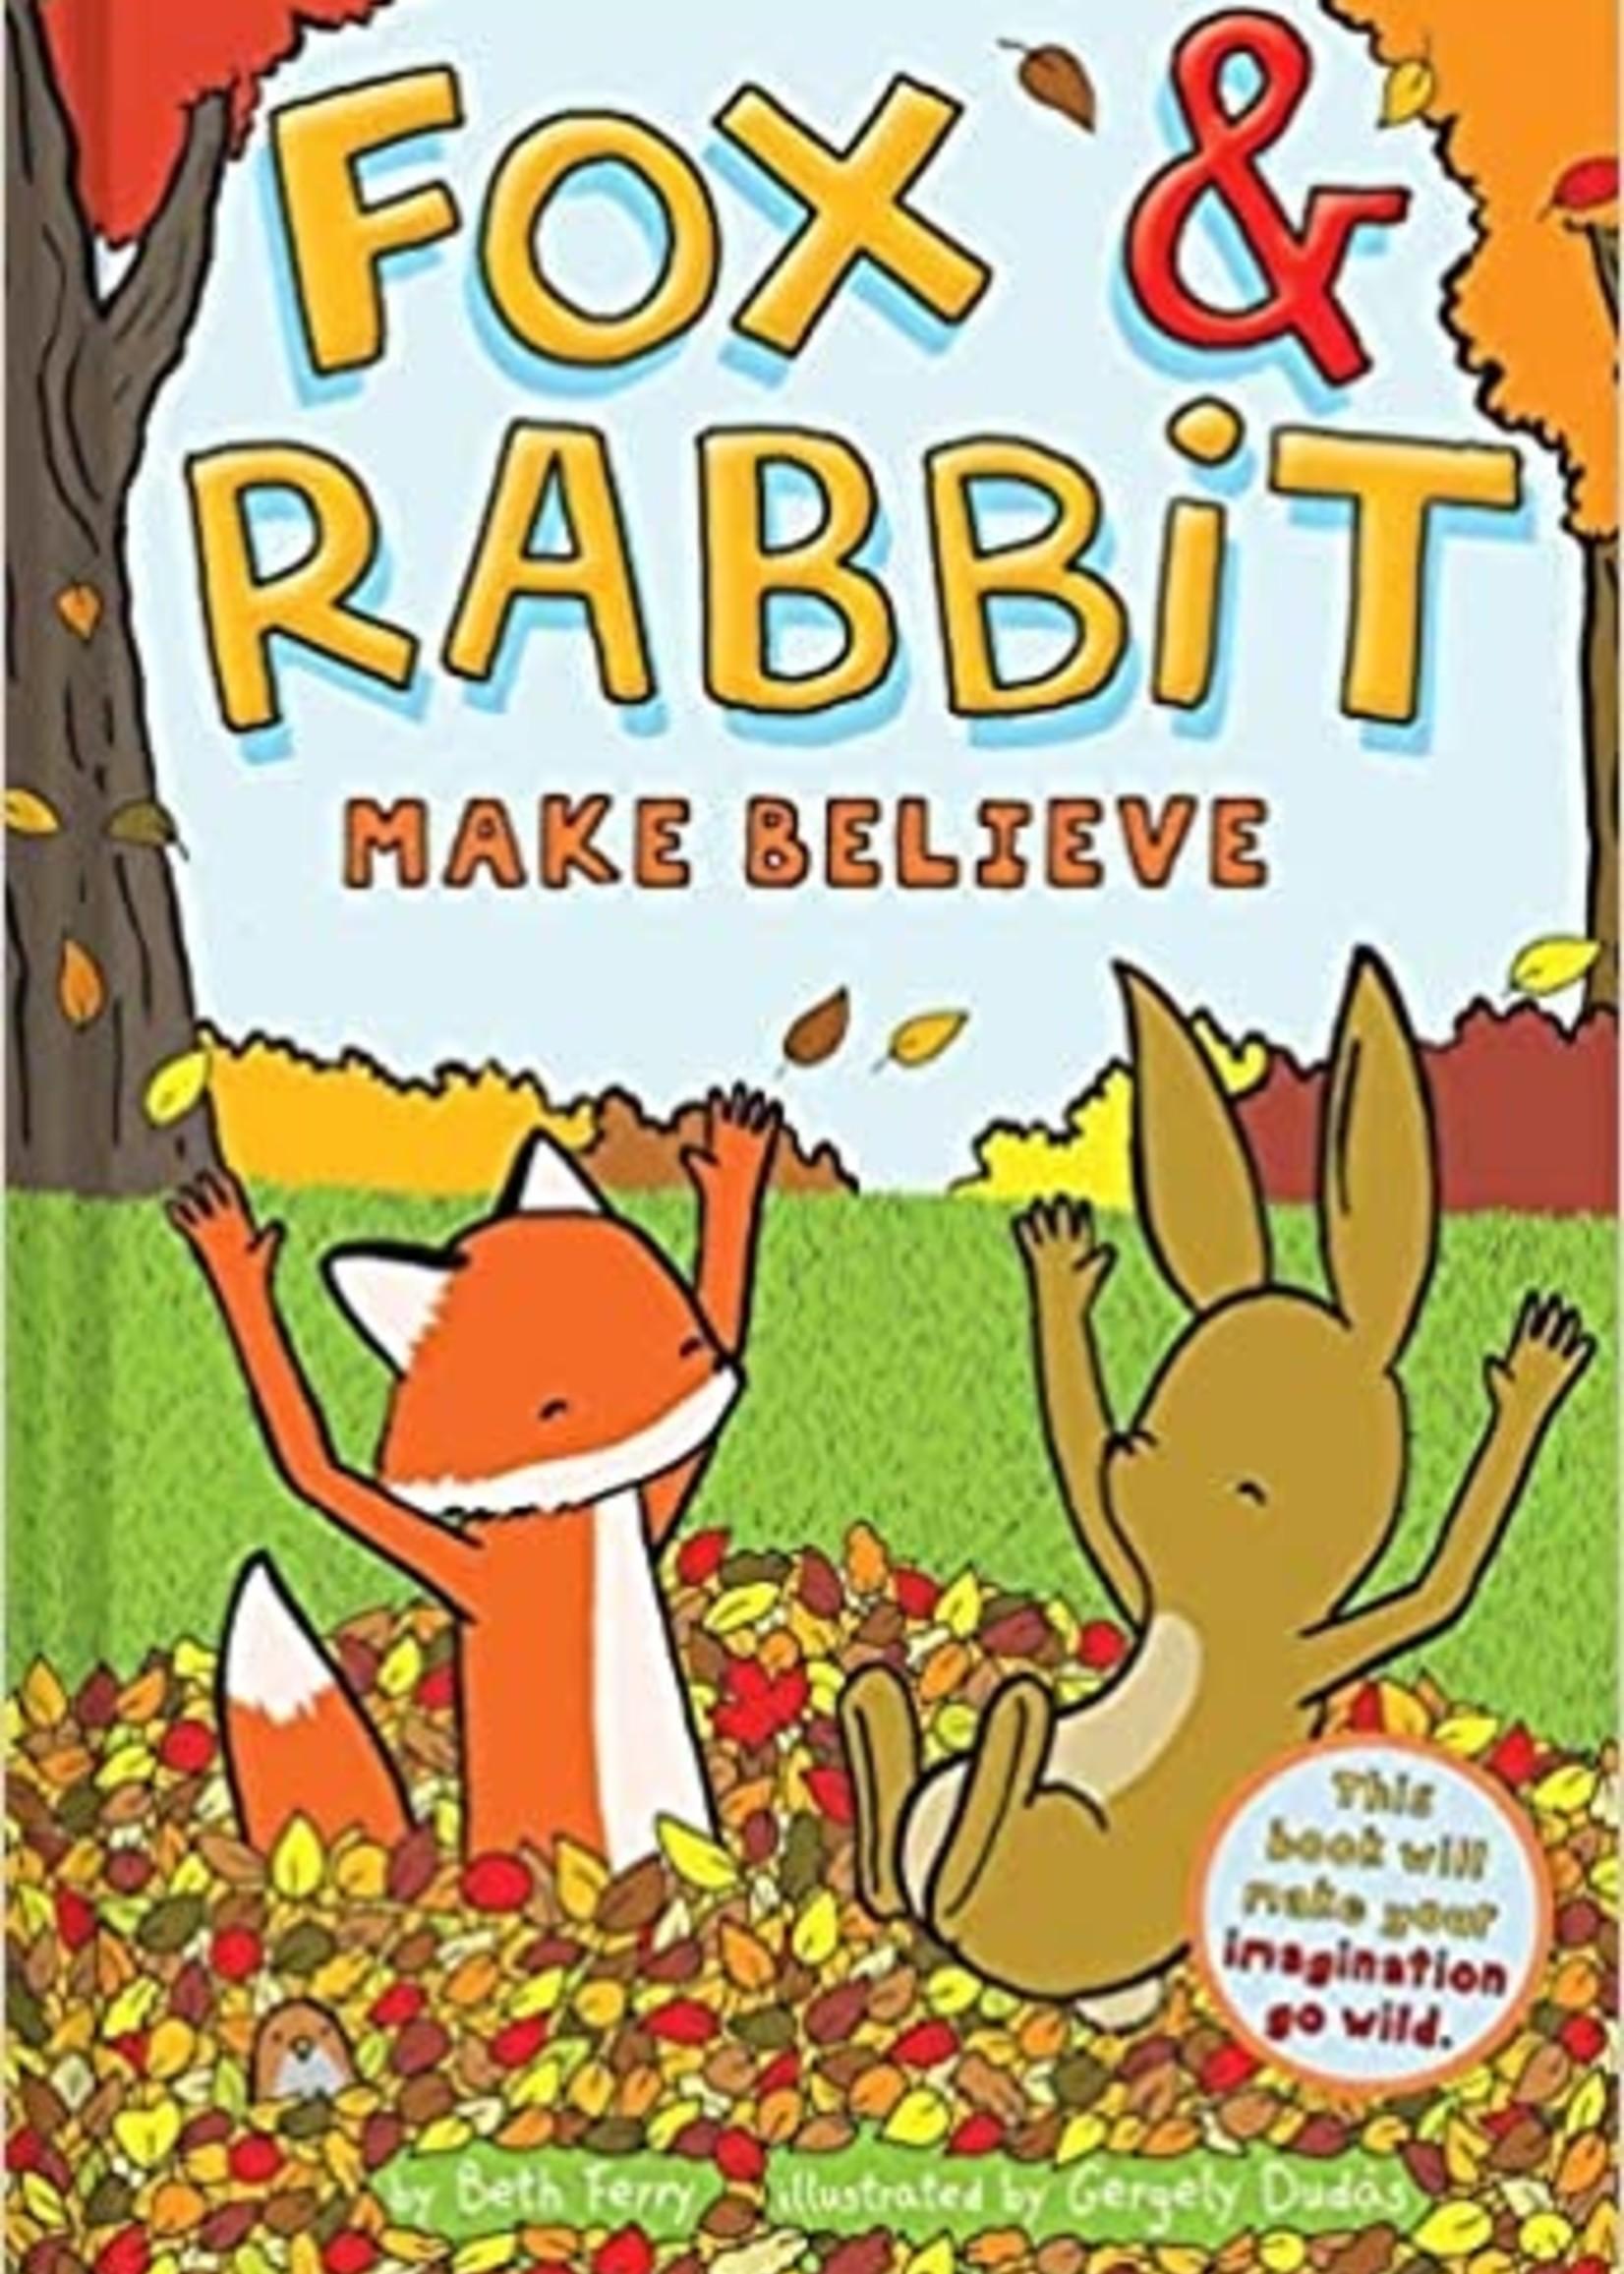 Fox & Rabbit #02, Fox & Rabbit Make Believe Graphic Novel - Hardcover